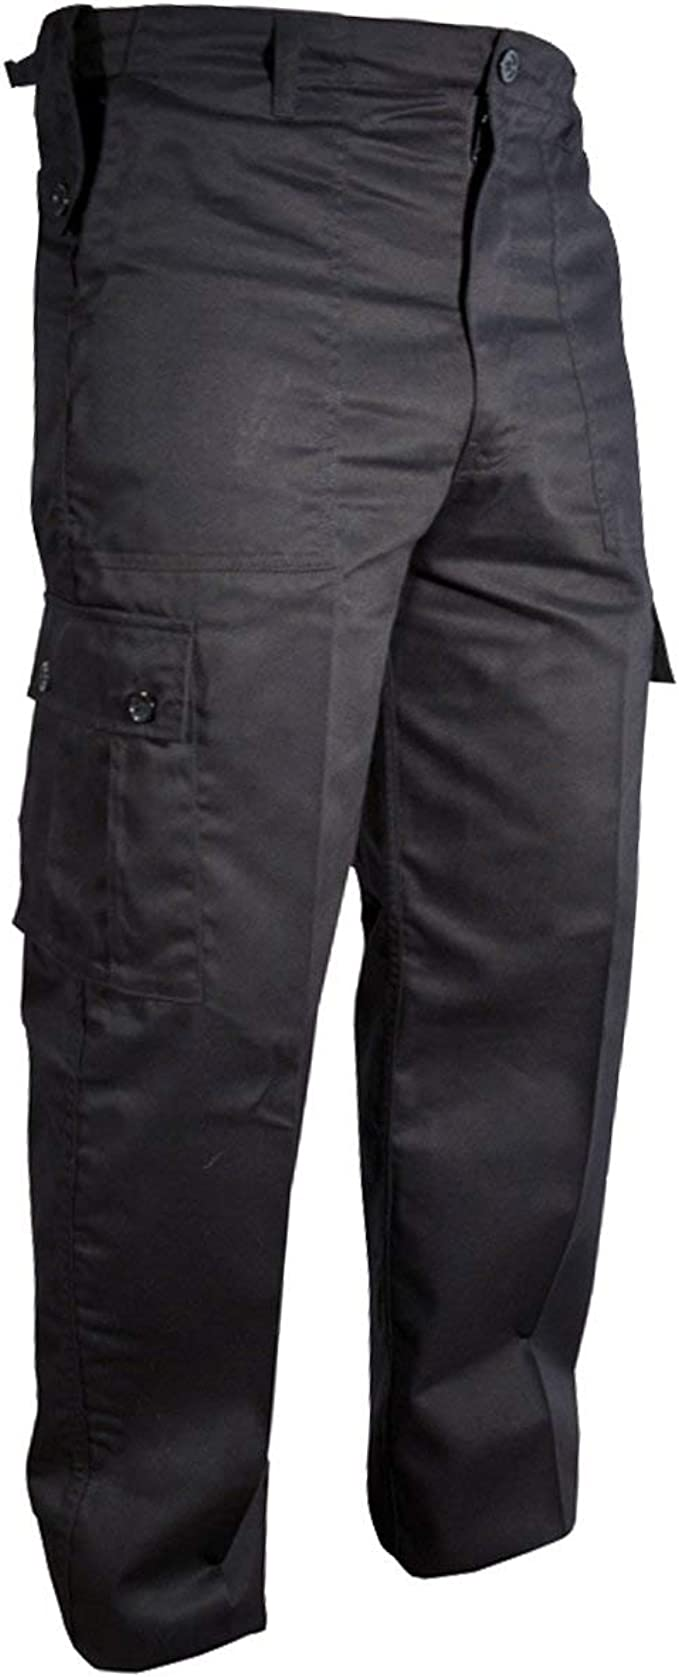 New 6 Pockets Workwear Pant Cargo Combat Outdoor Carpenter Builder Cargo Trouser